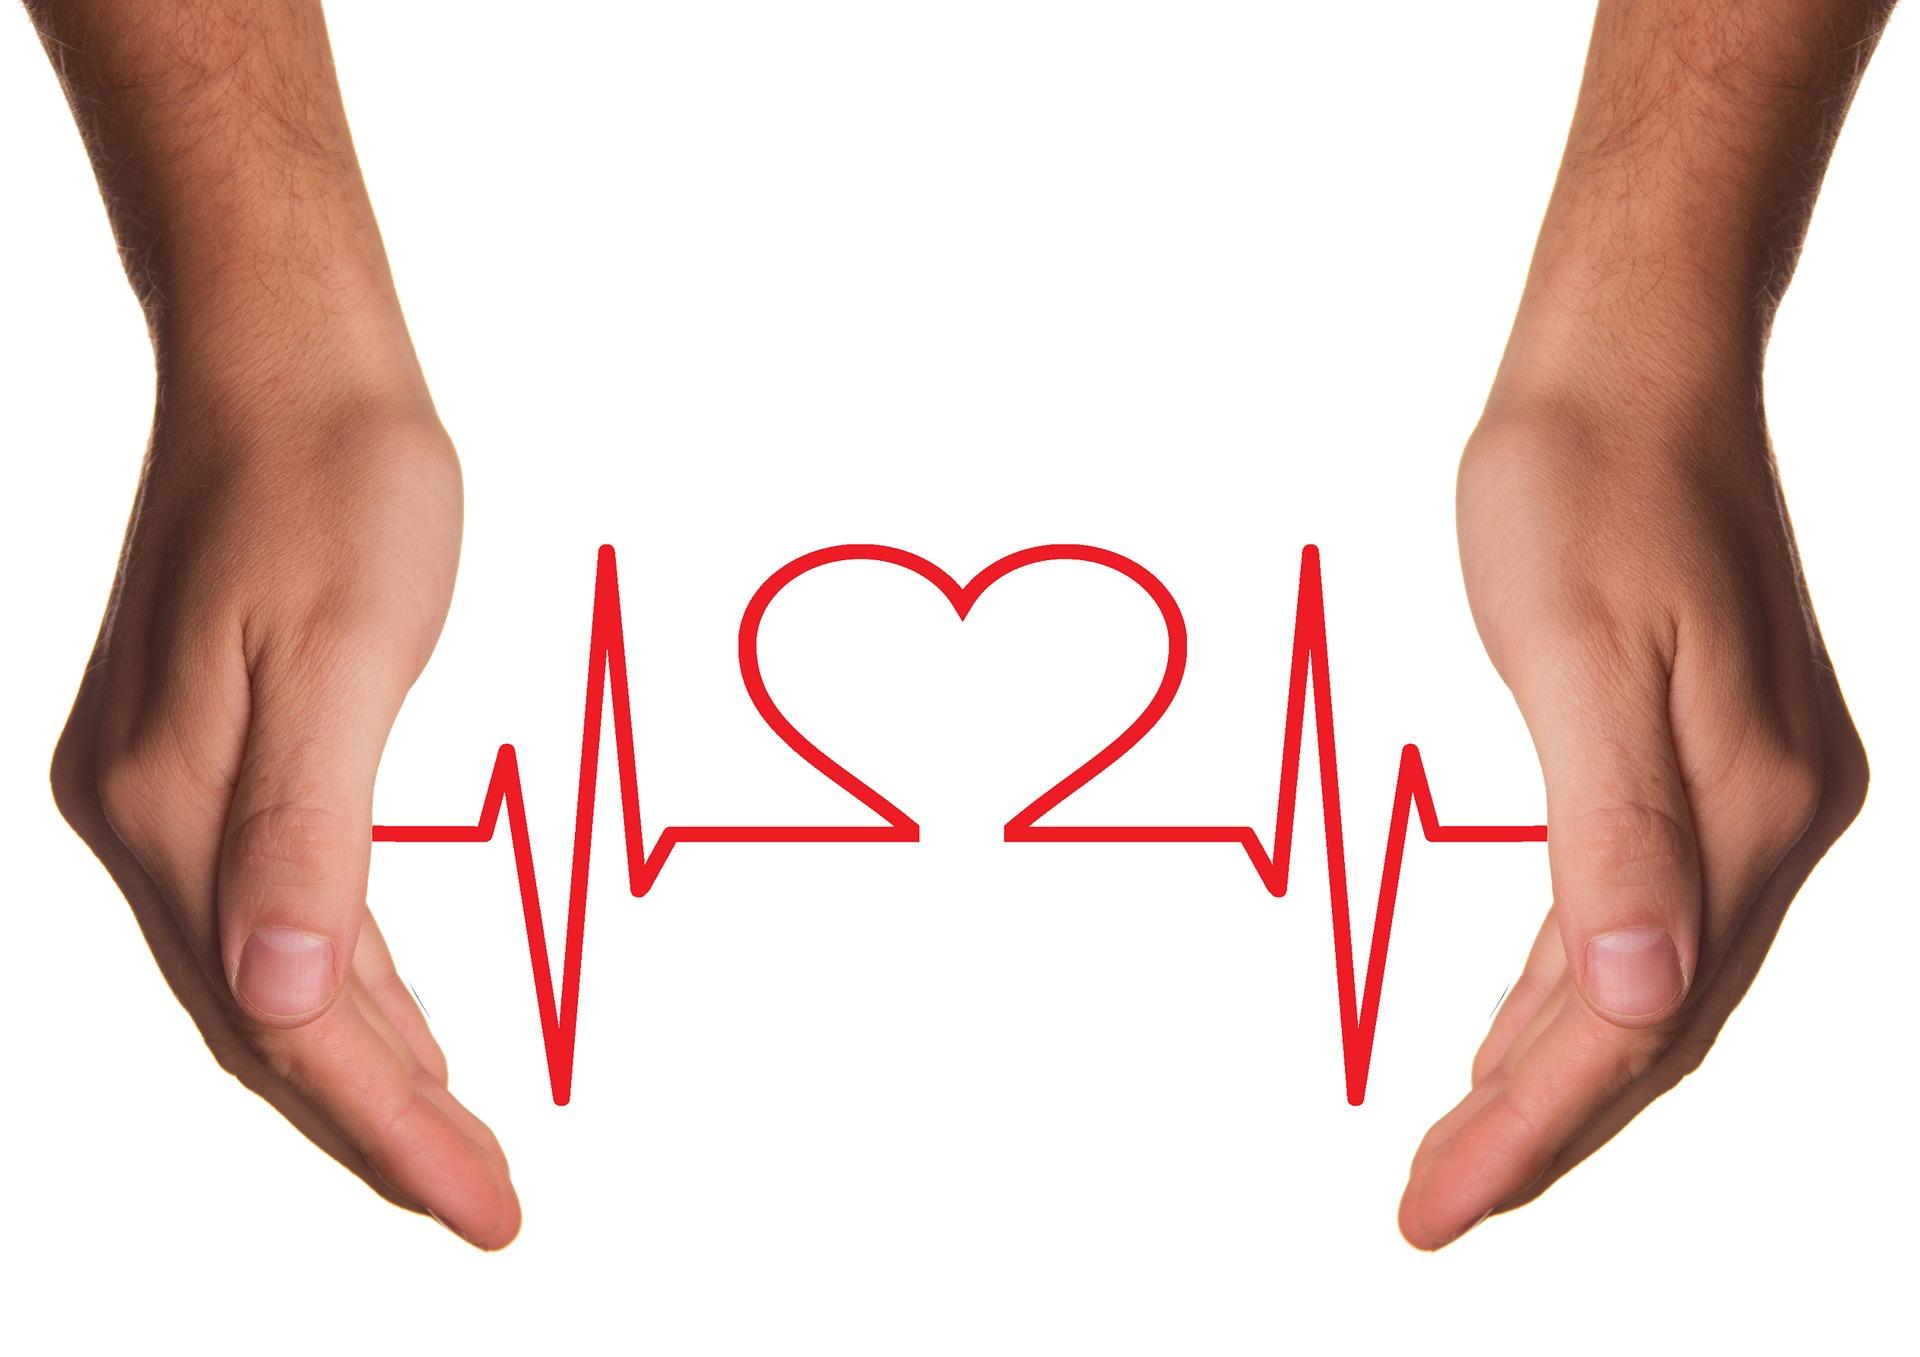 heart-care-1040227_1920